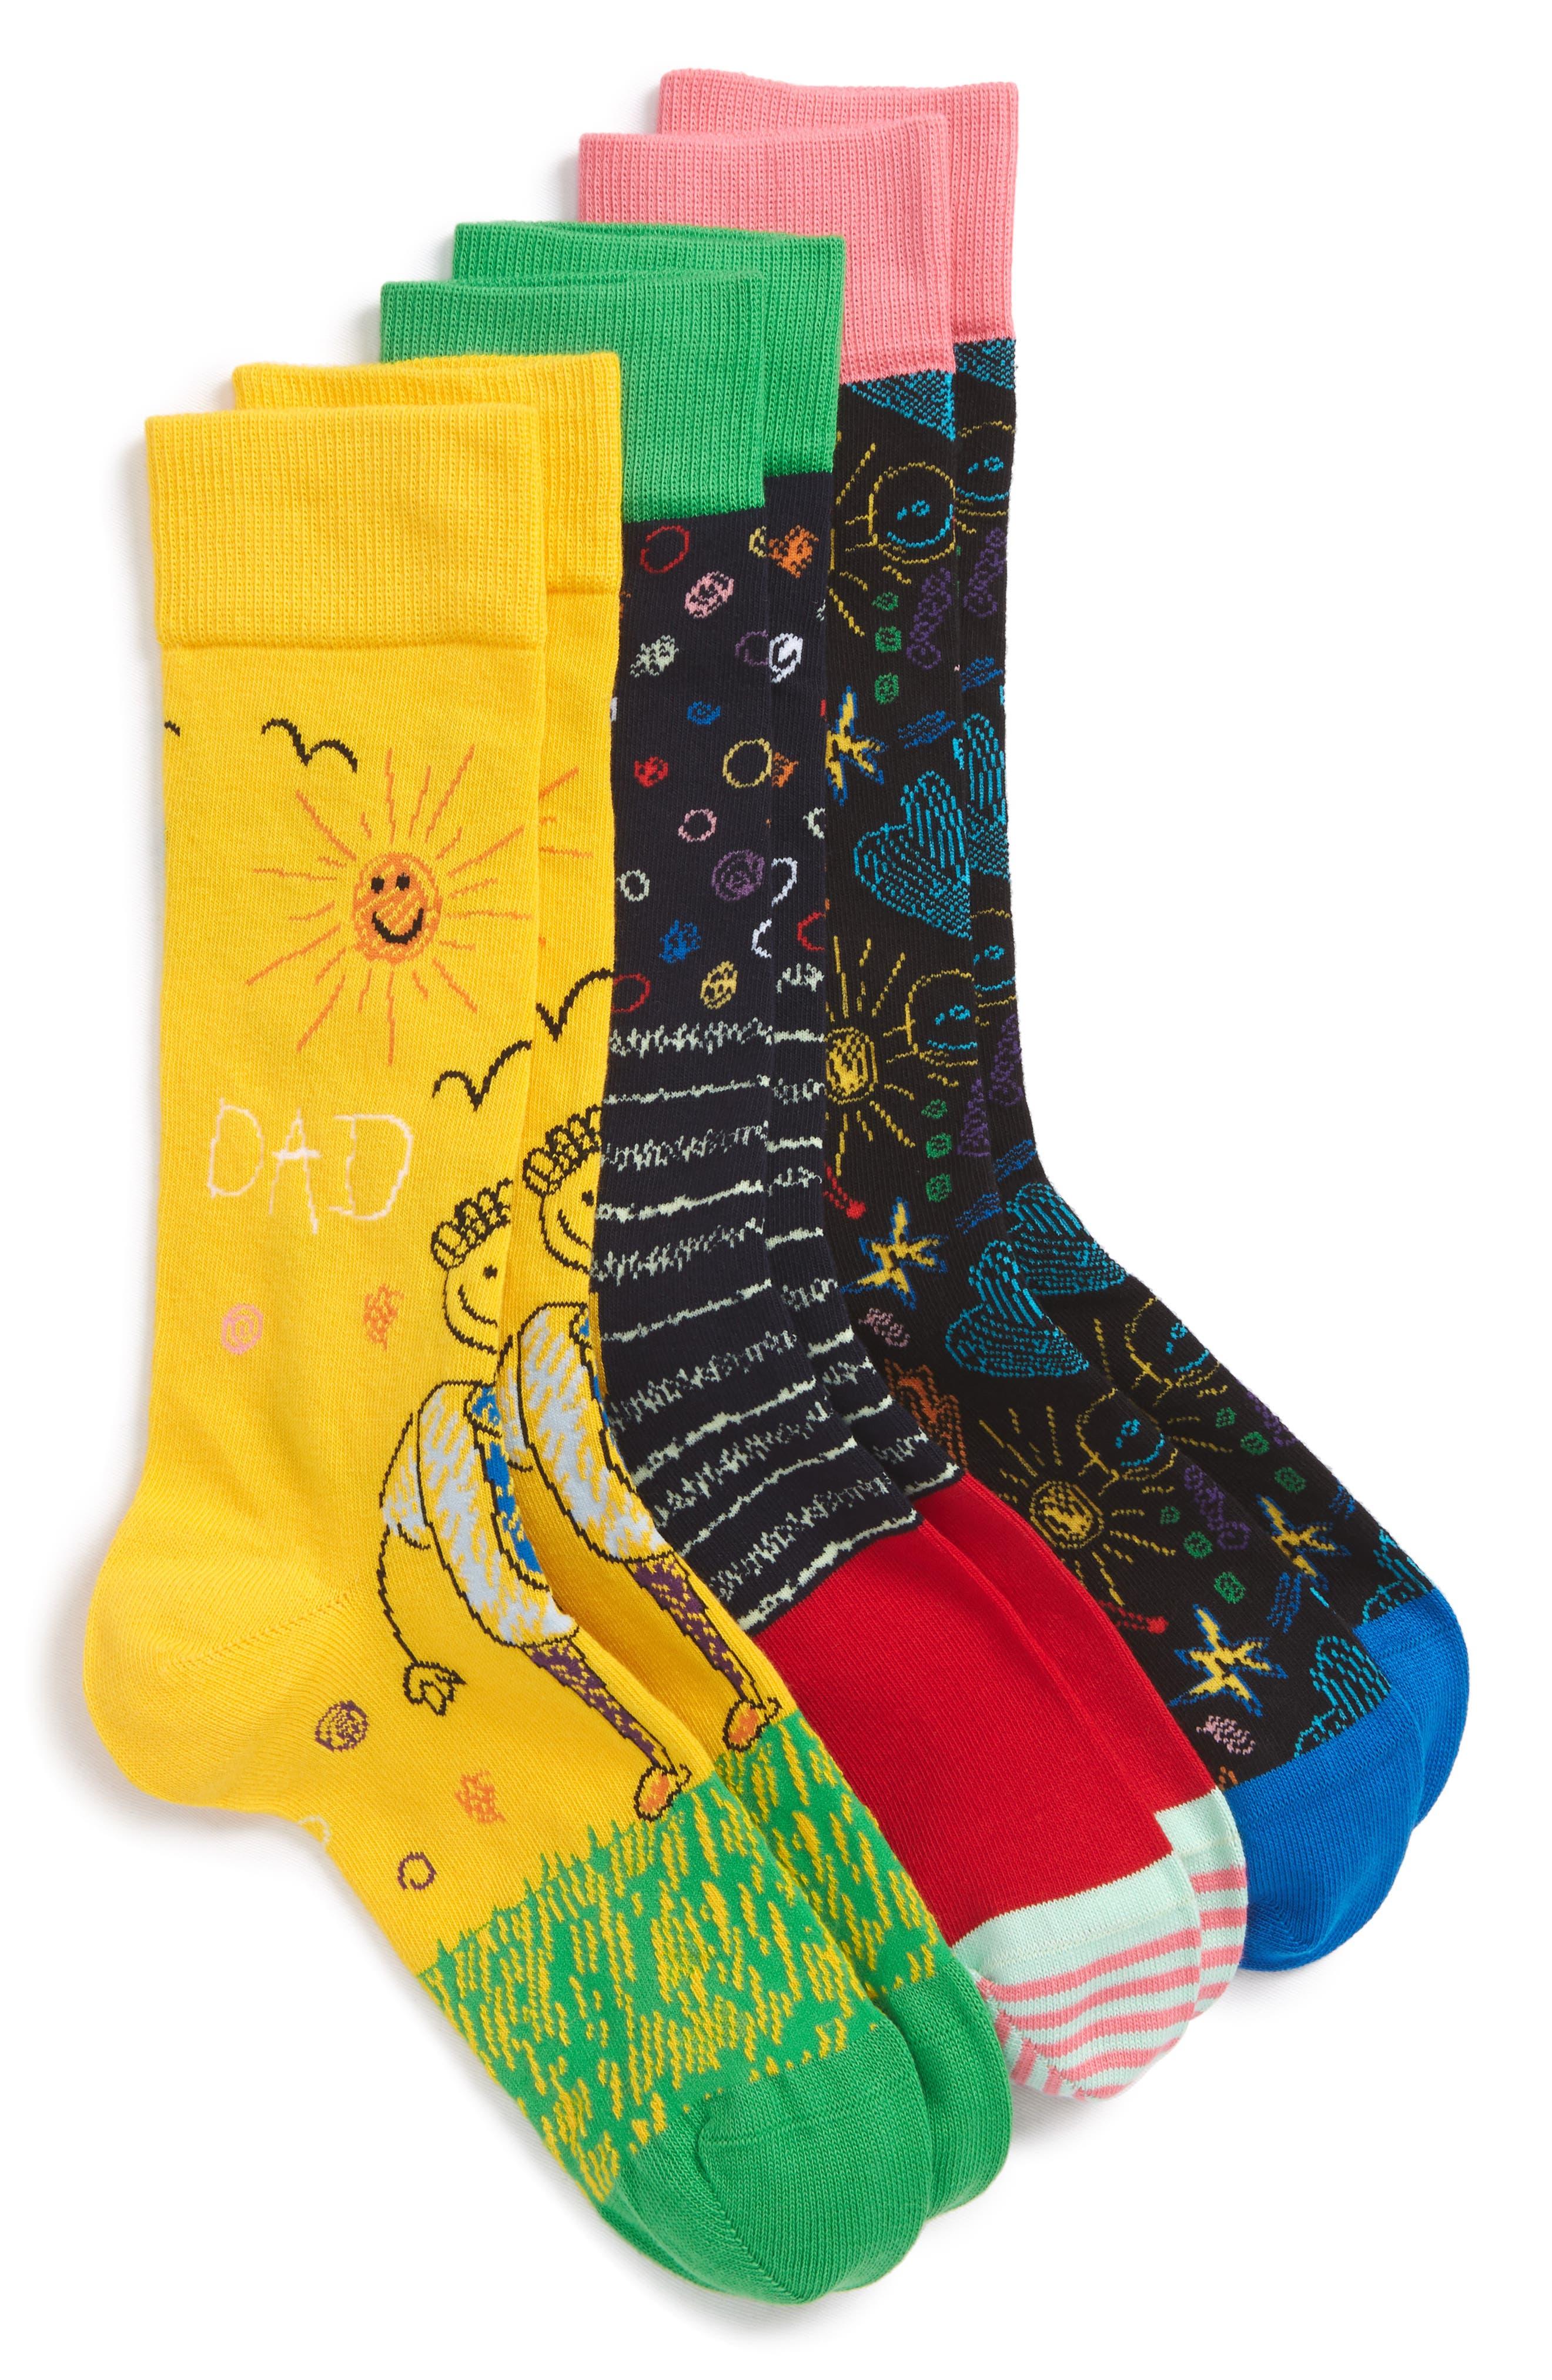 I Love You Dad 3-Pack Socks,                         Main,                         color, Black/ Yellow Multi